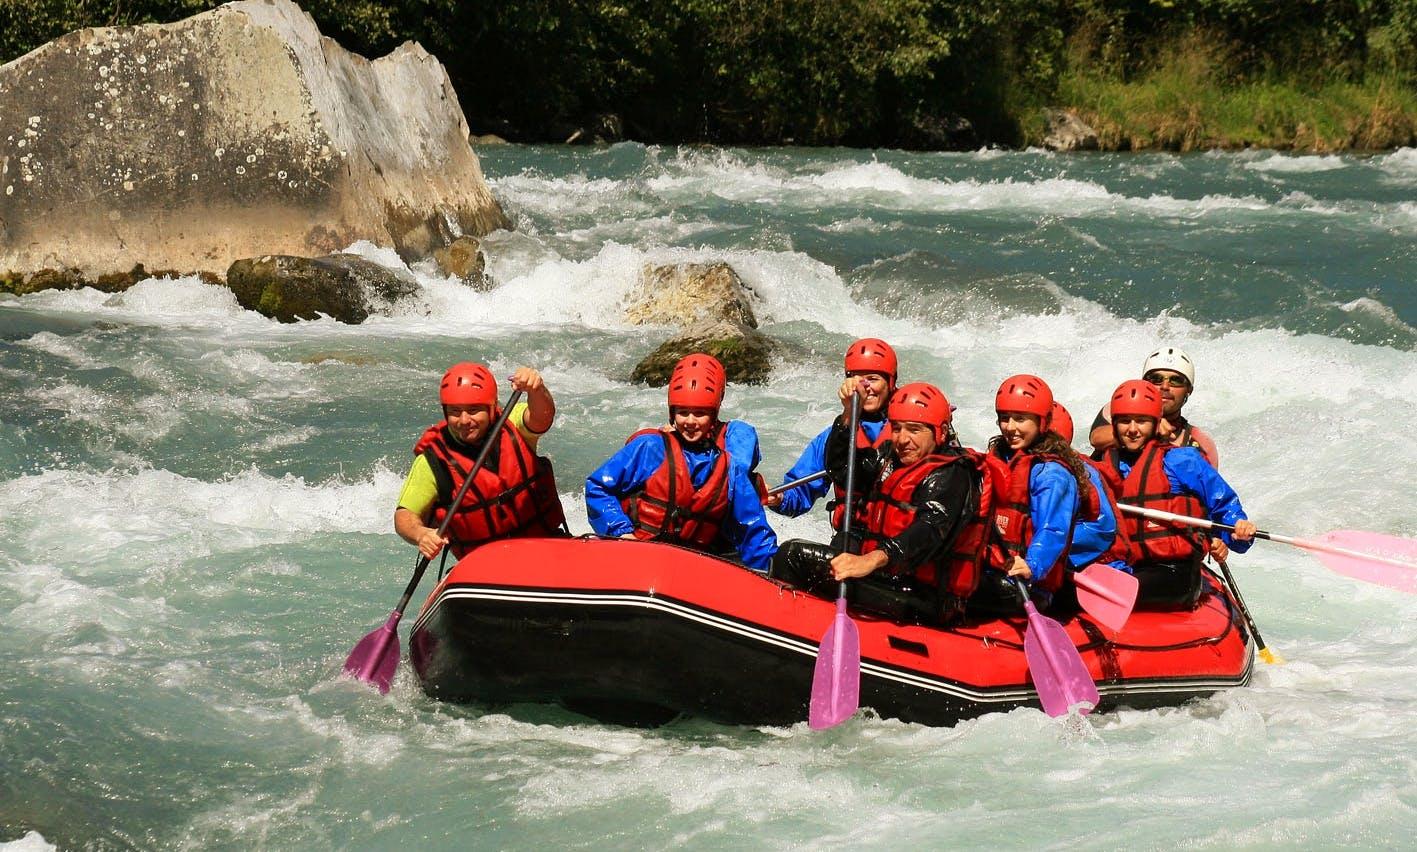 Rafting and Zipline Tours In Miraflores